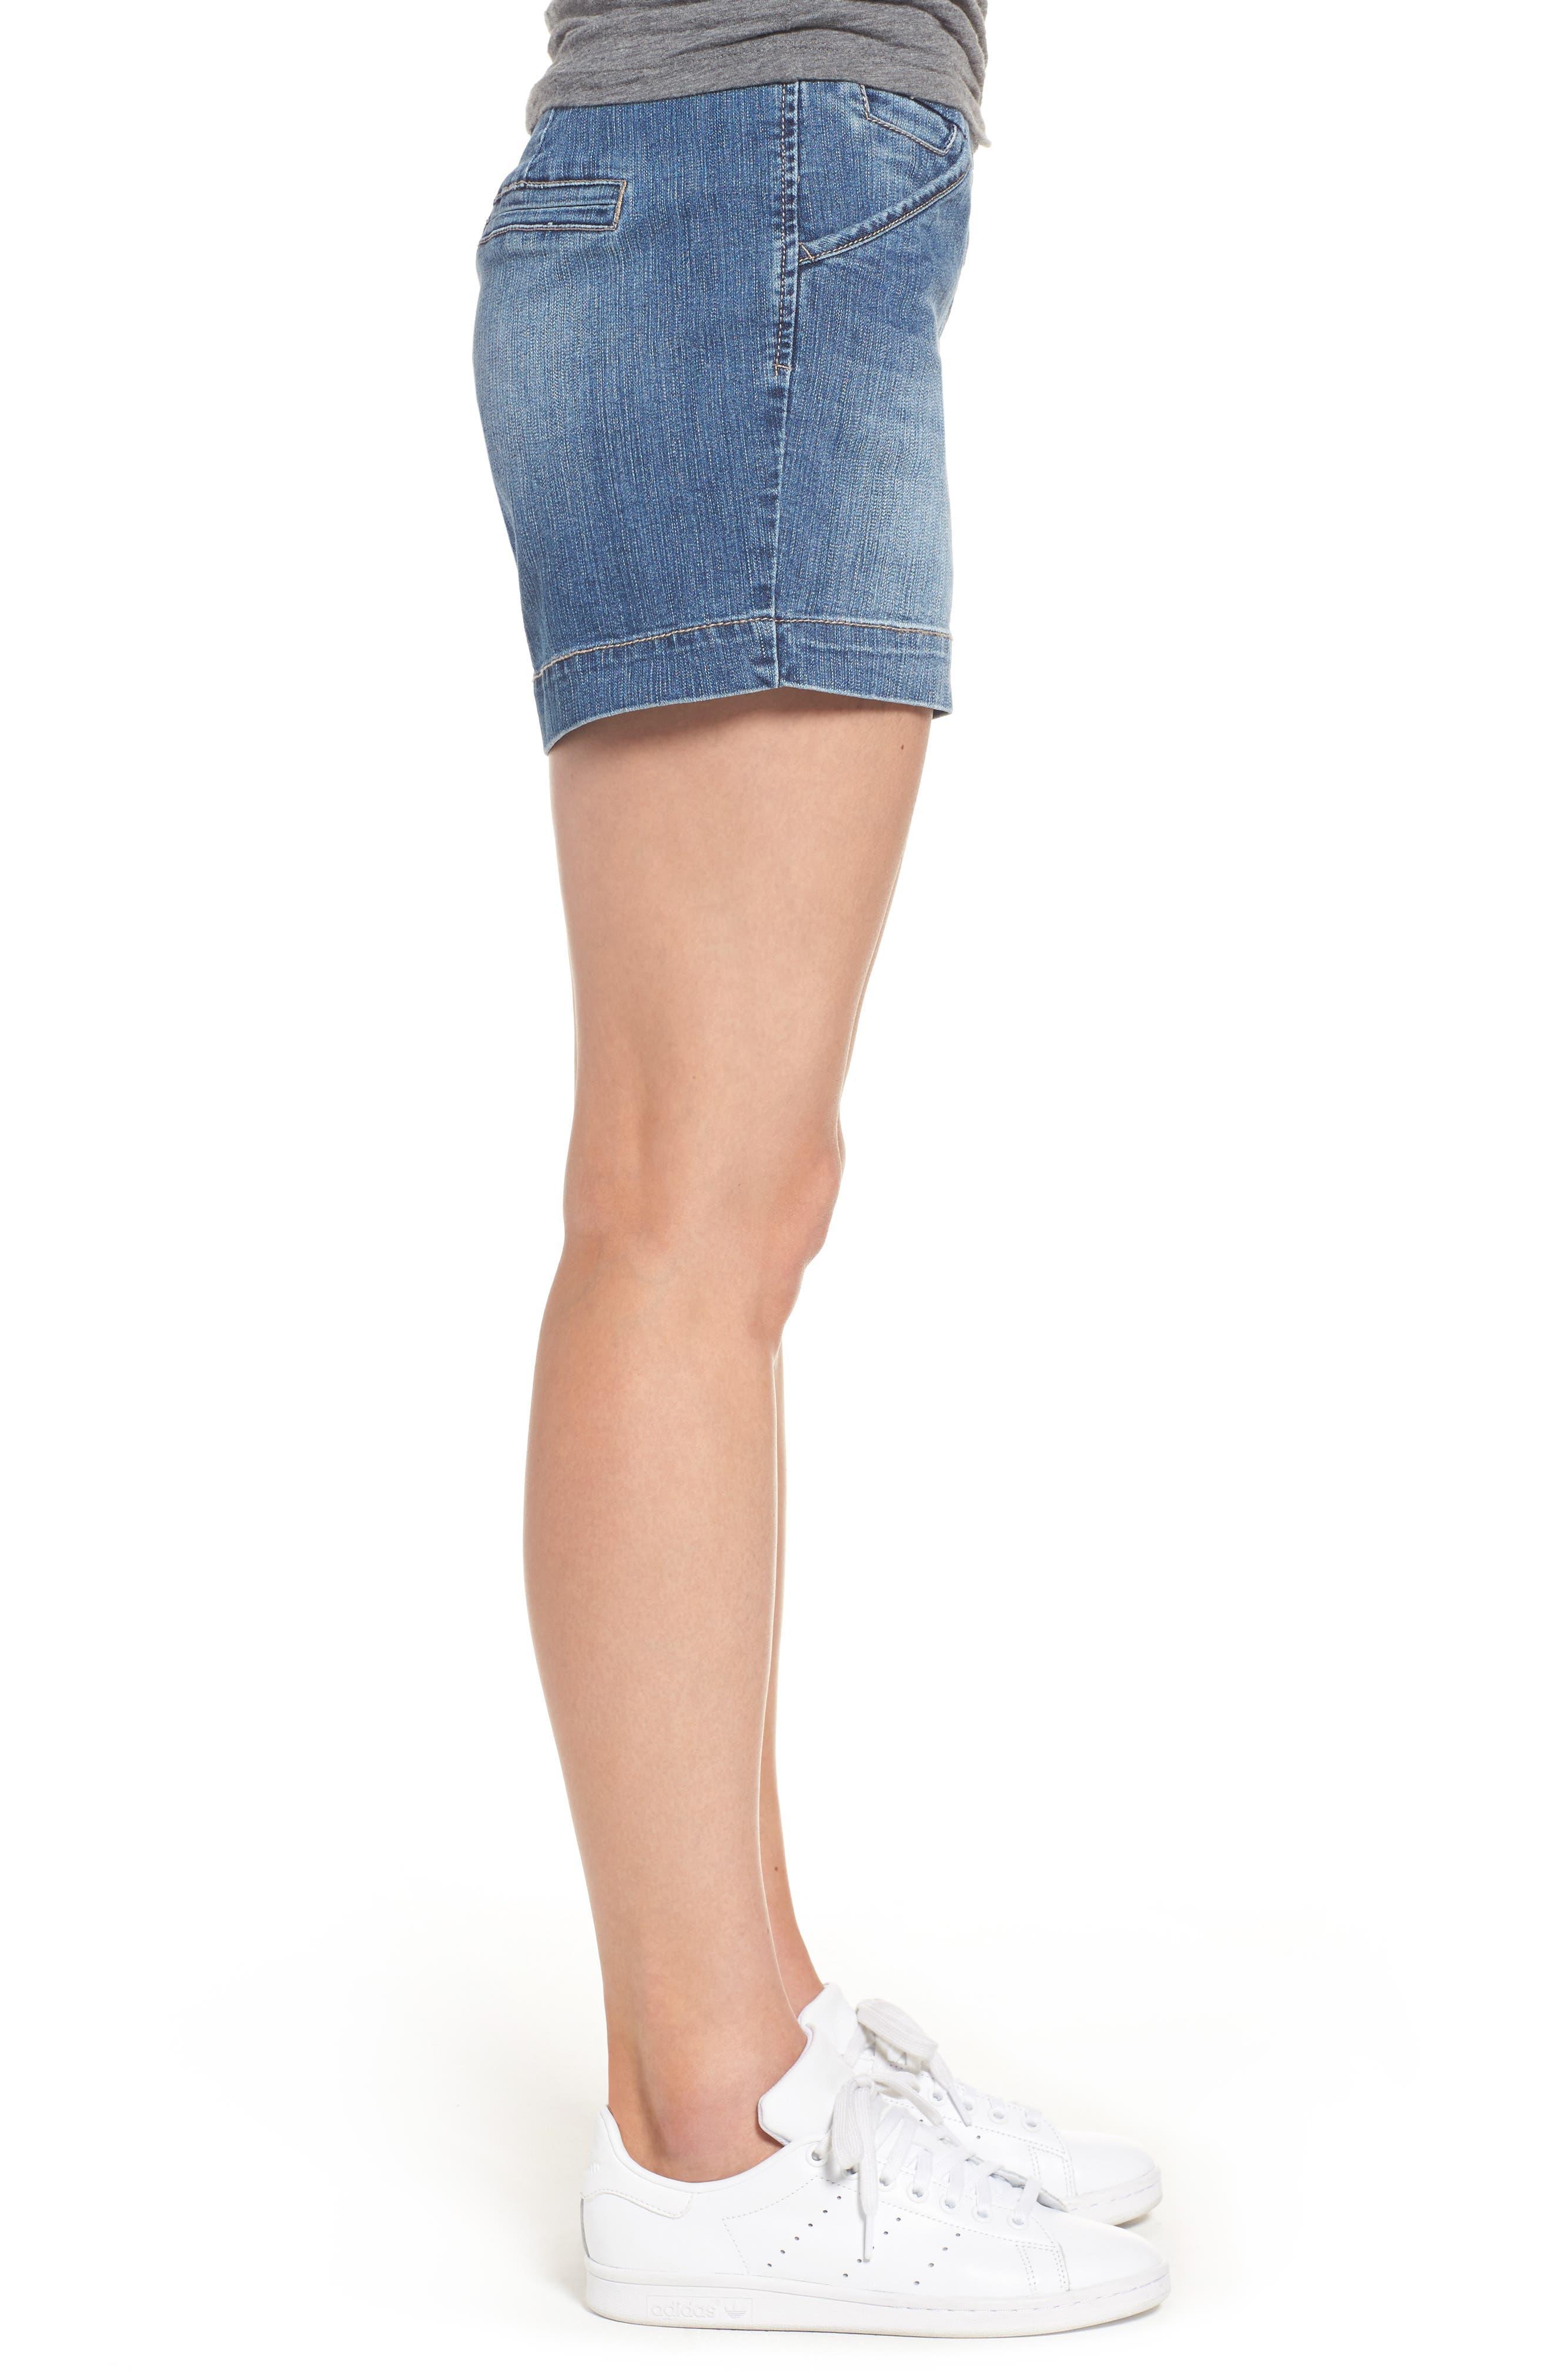 Ainsley Pull-On Denim Shorts,                             Alternate thumbnail 3, color,                             402